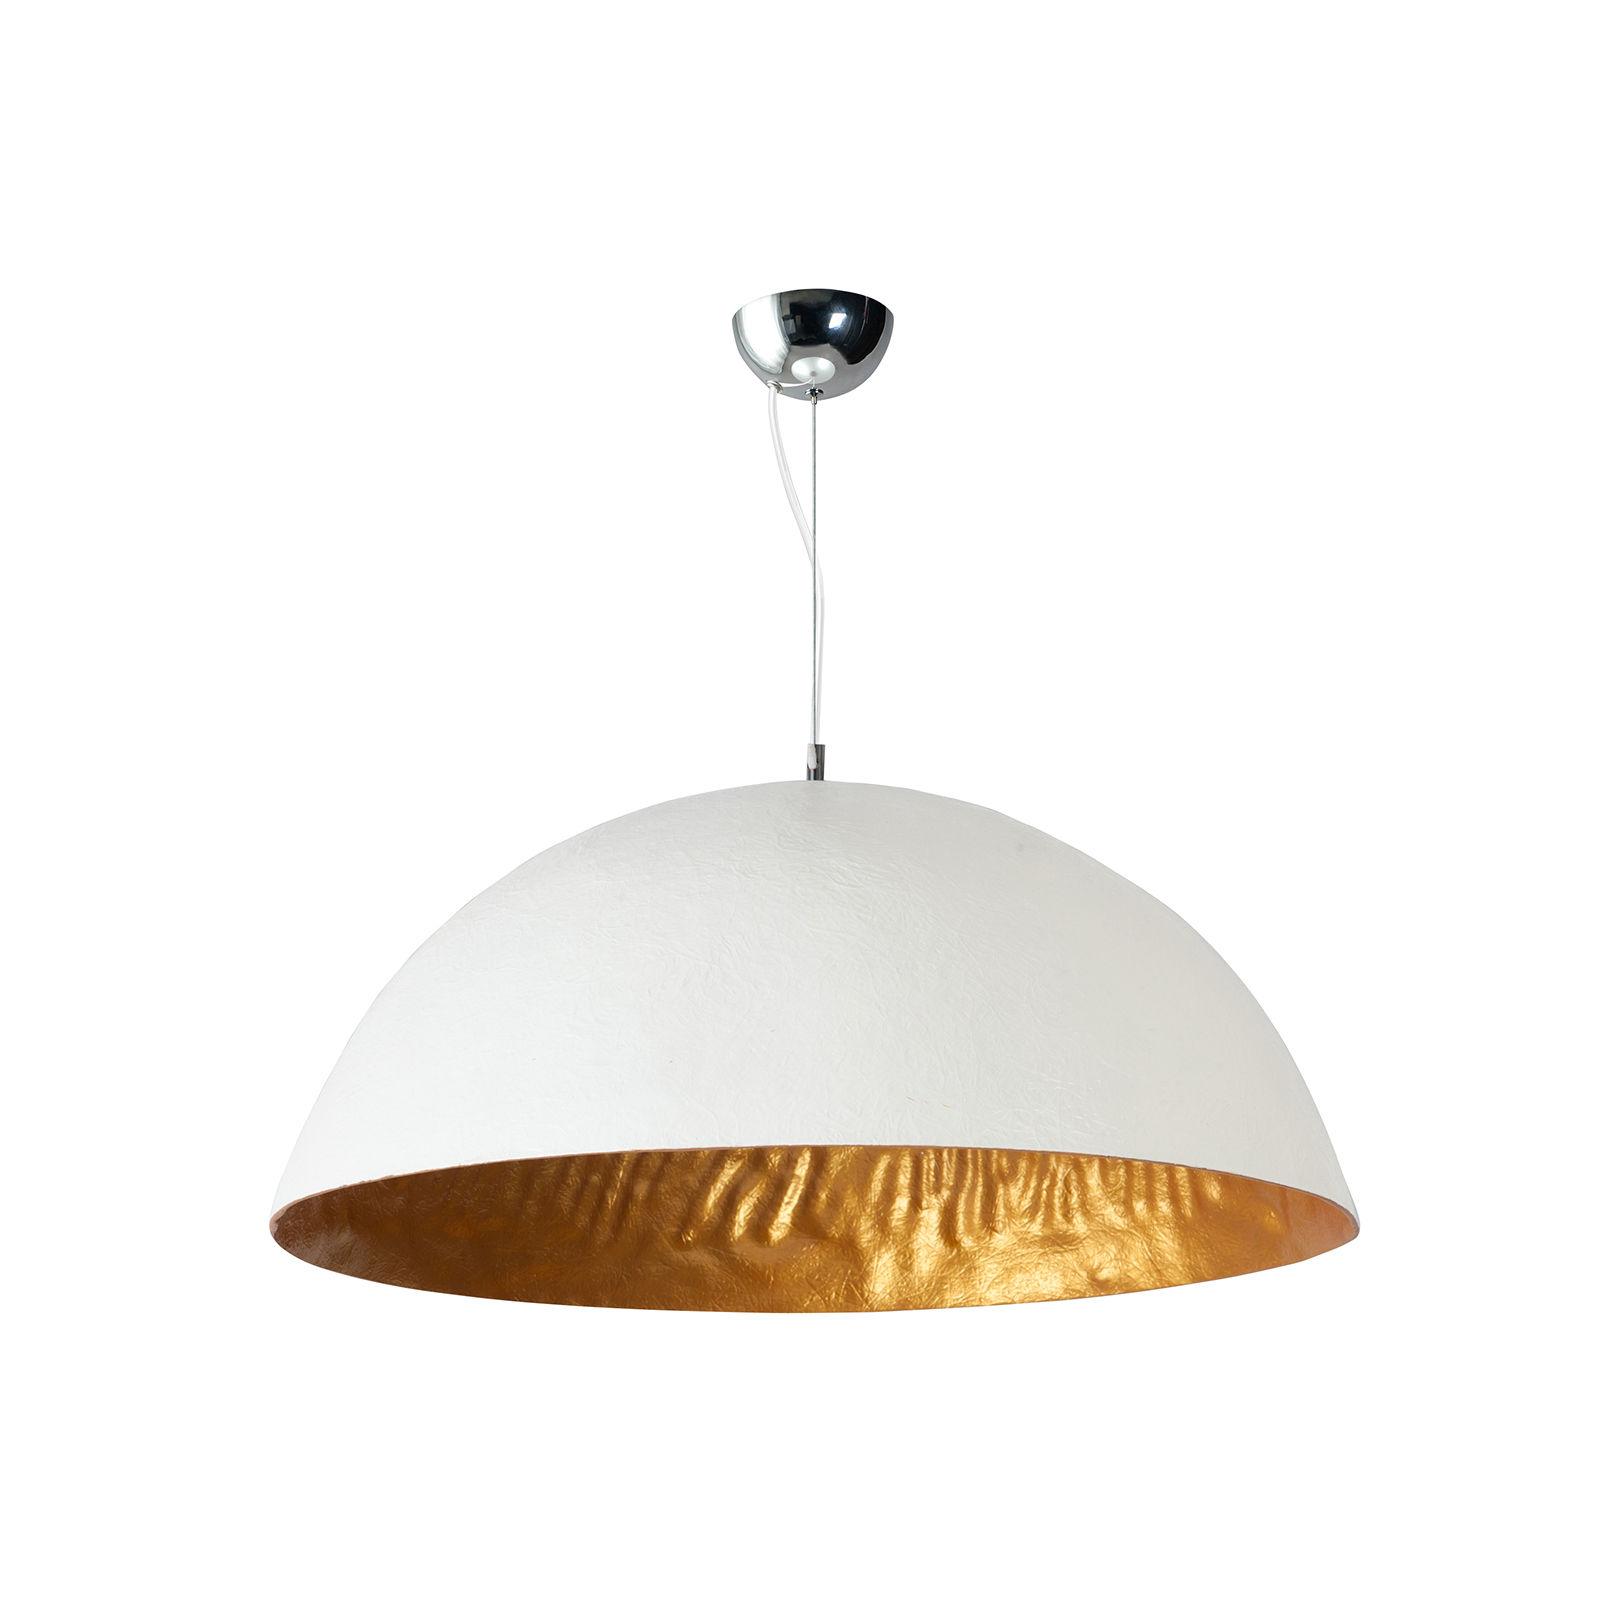 OUTLET - Mezzo Tondo hanglamp ETH wit/goud � 70cm